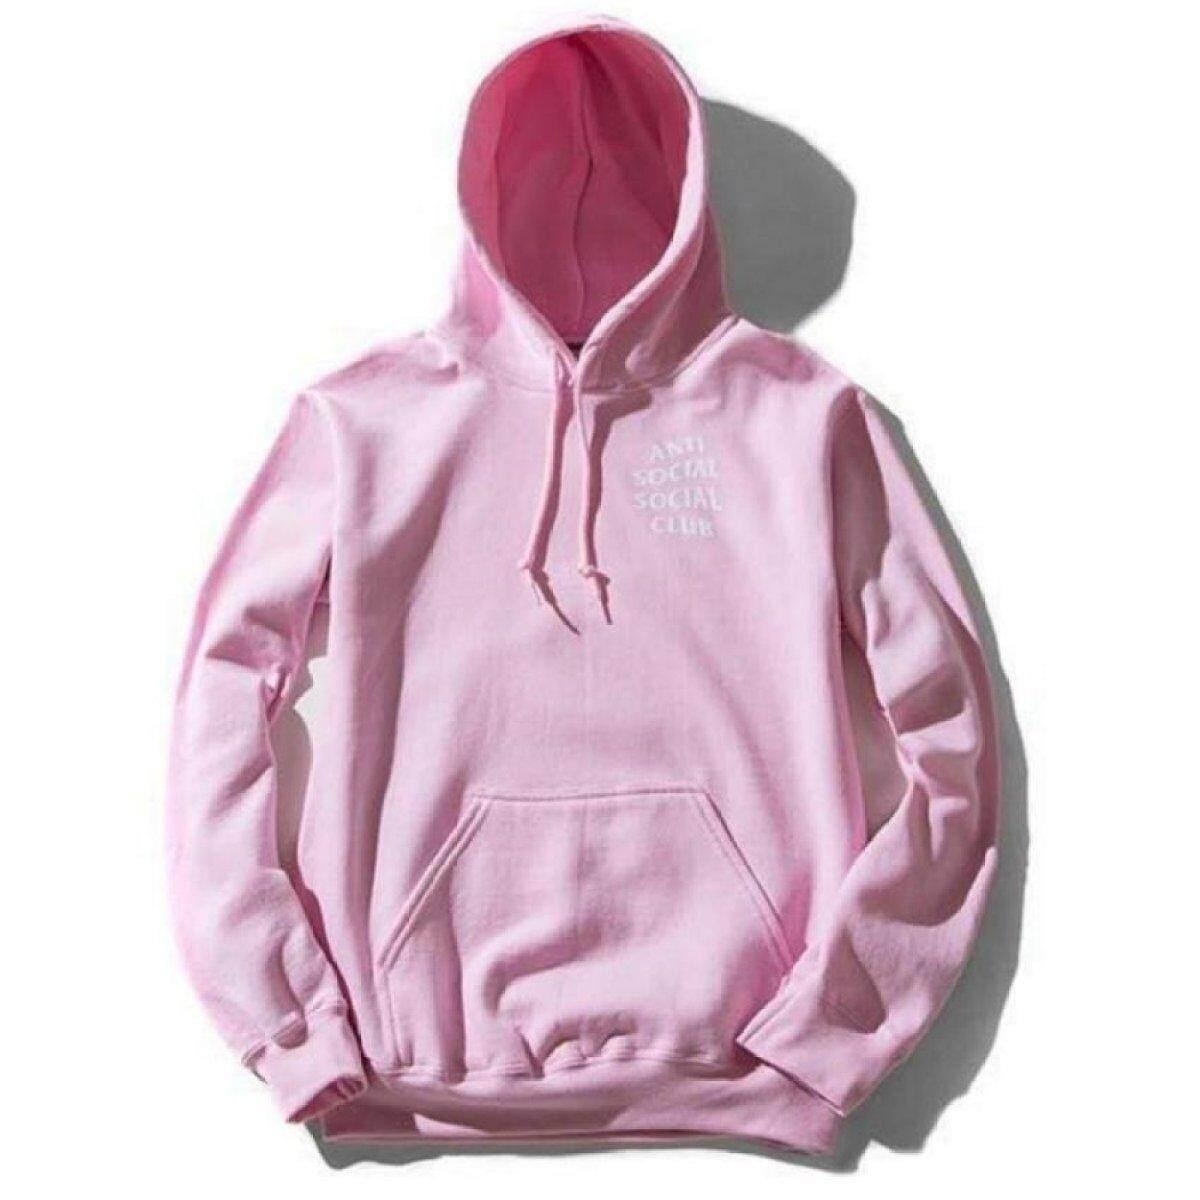 Kuhong Men Sweatshirts Autumn Fashion Hooded Hip Hop Style Streetwear Tracksuit Hoodies Pink - intl